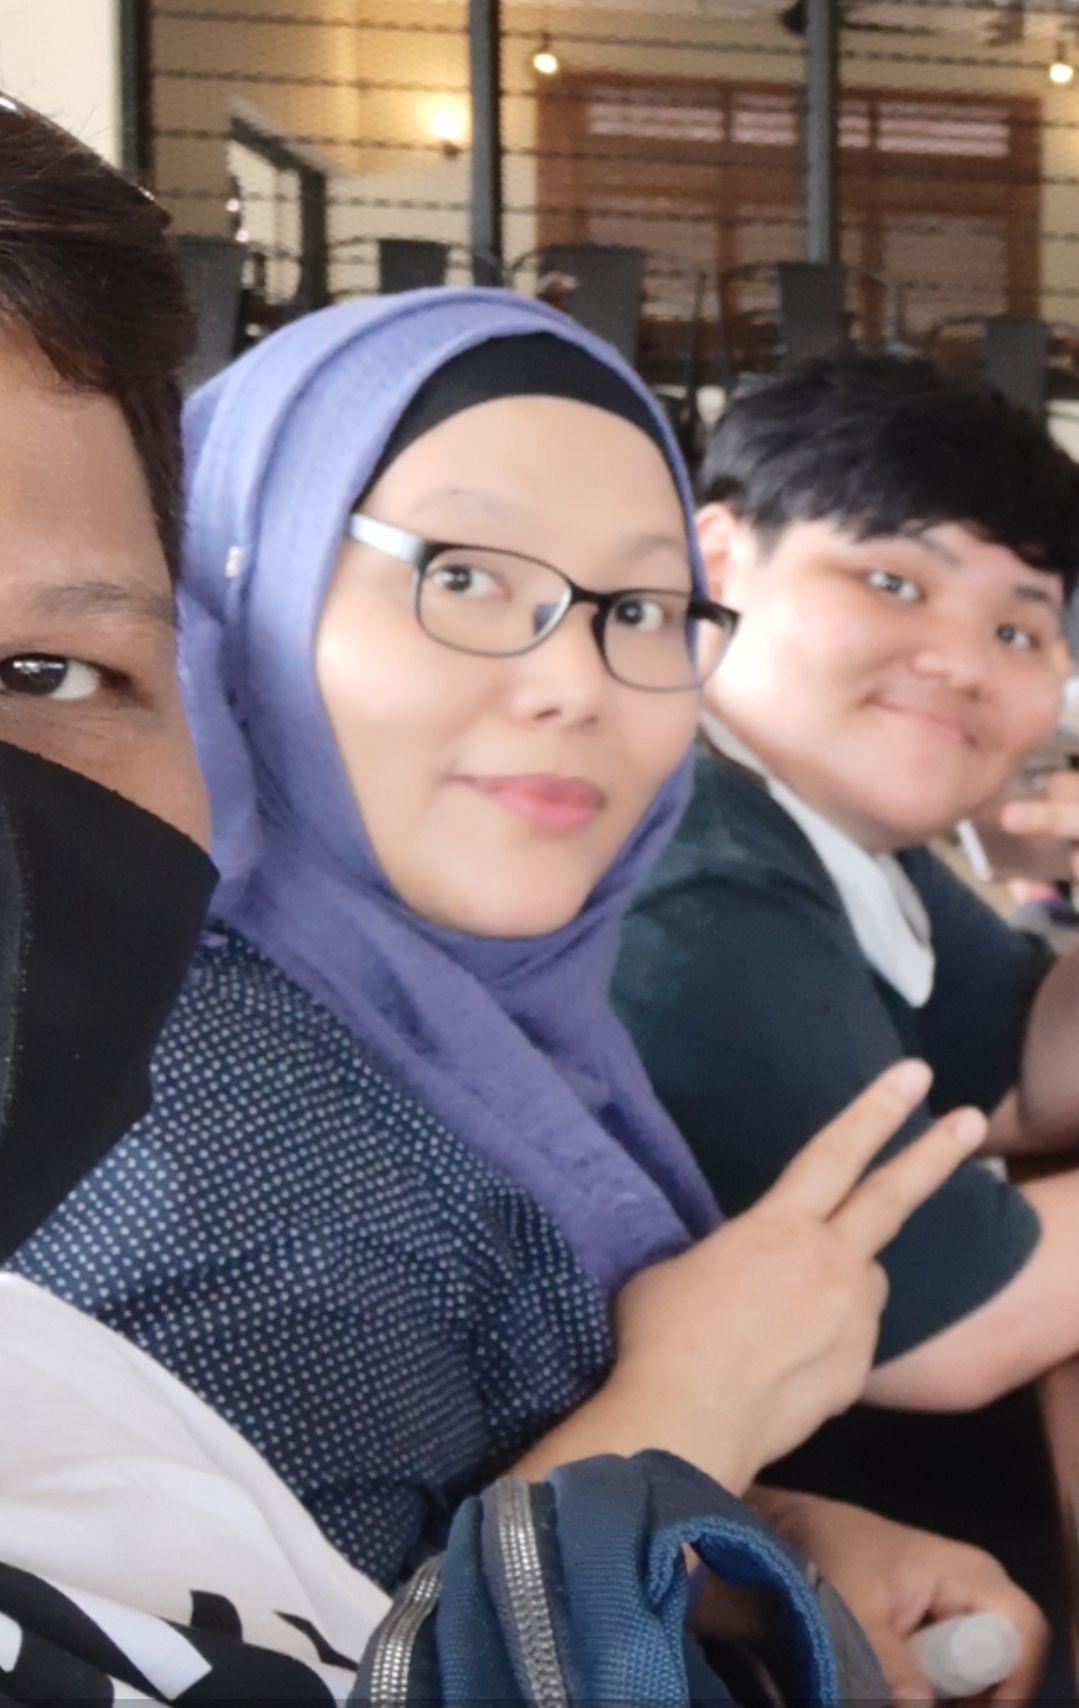 Kamsiah Malik shows the peace sign. She wears a headscarf, polka dot top and dark rimmed glasses.